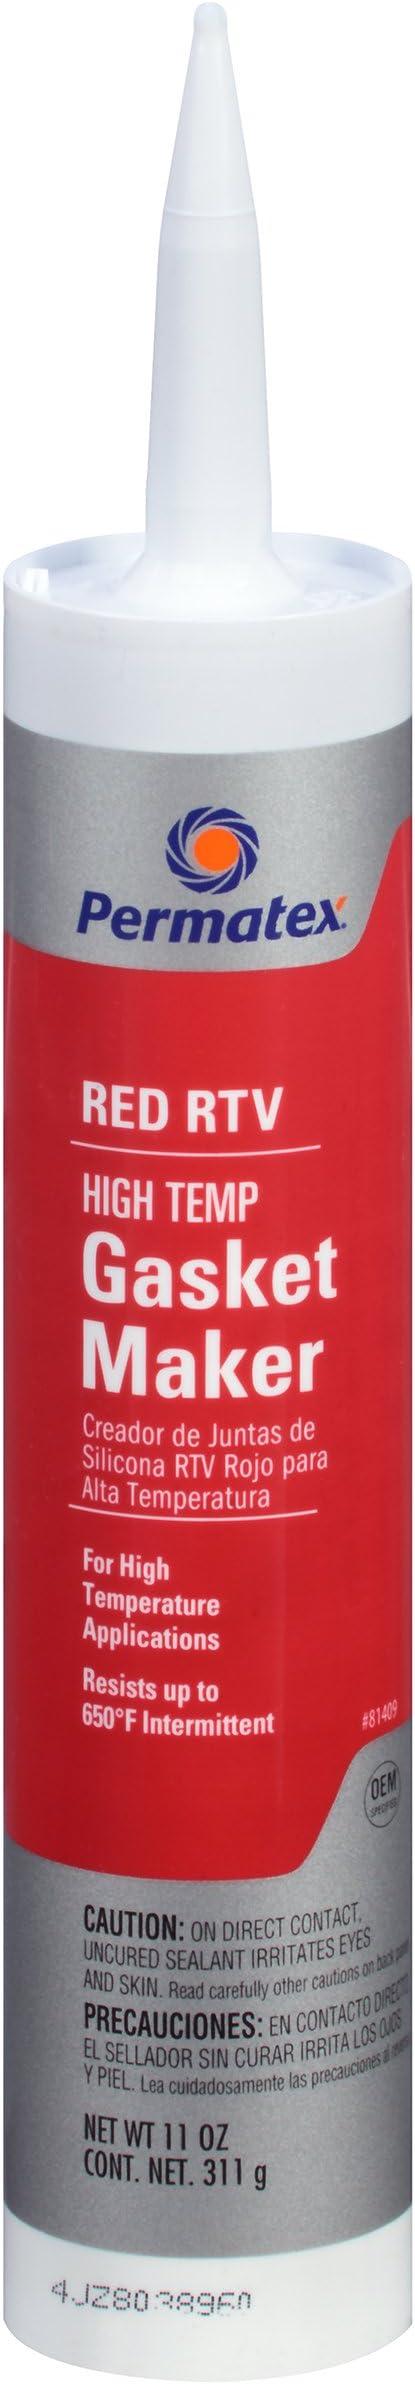 MAGTOOLS Grey Max Oil Resistance Silicone Gasket Maker Rigid  RTV 3OZ 85g 2017